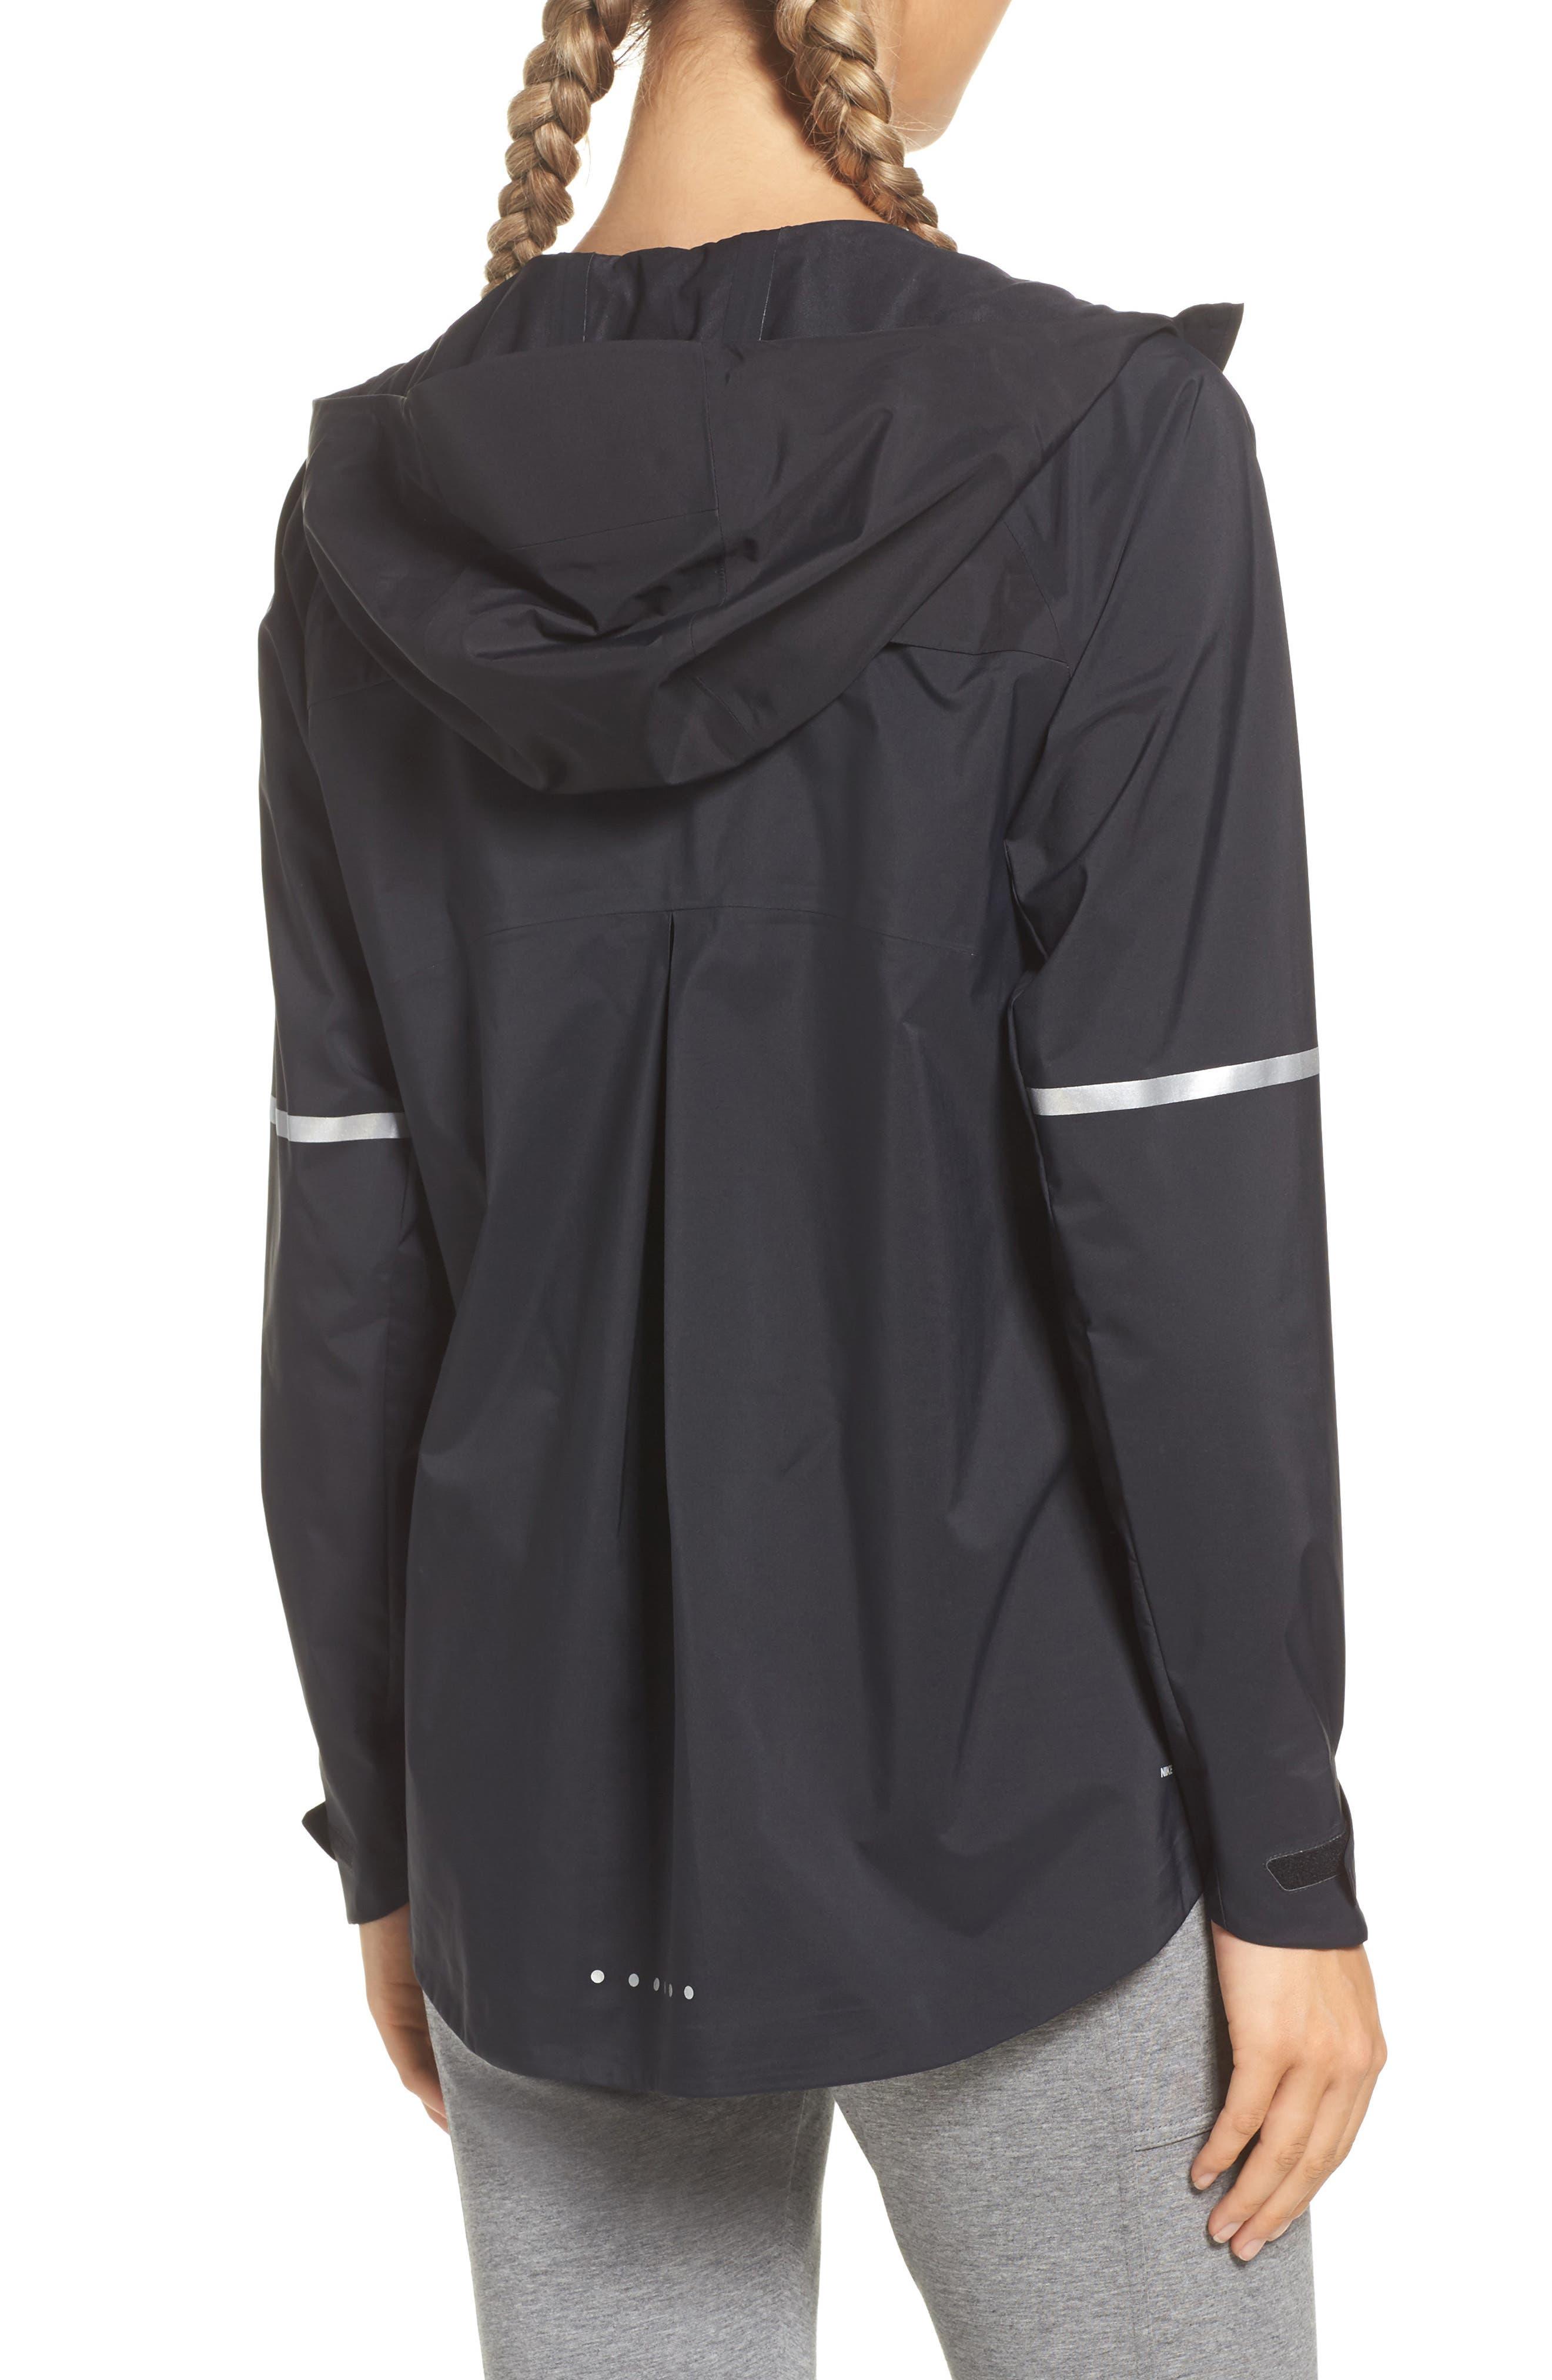 Zonal AeroShield Hooded Running Jacket,                             Alternate thumbnail 2, color,                             010